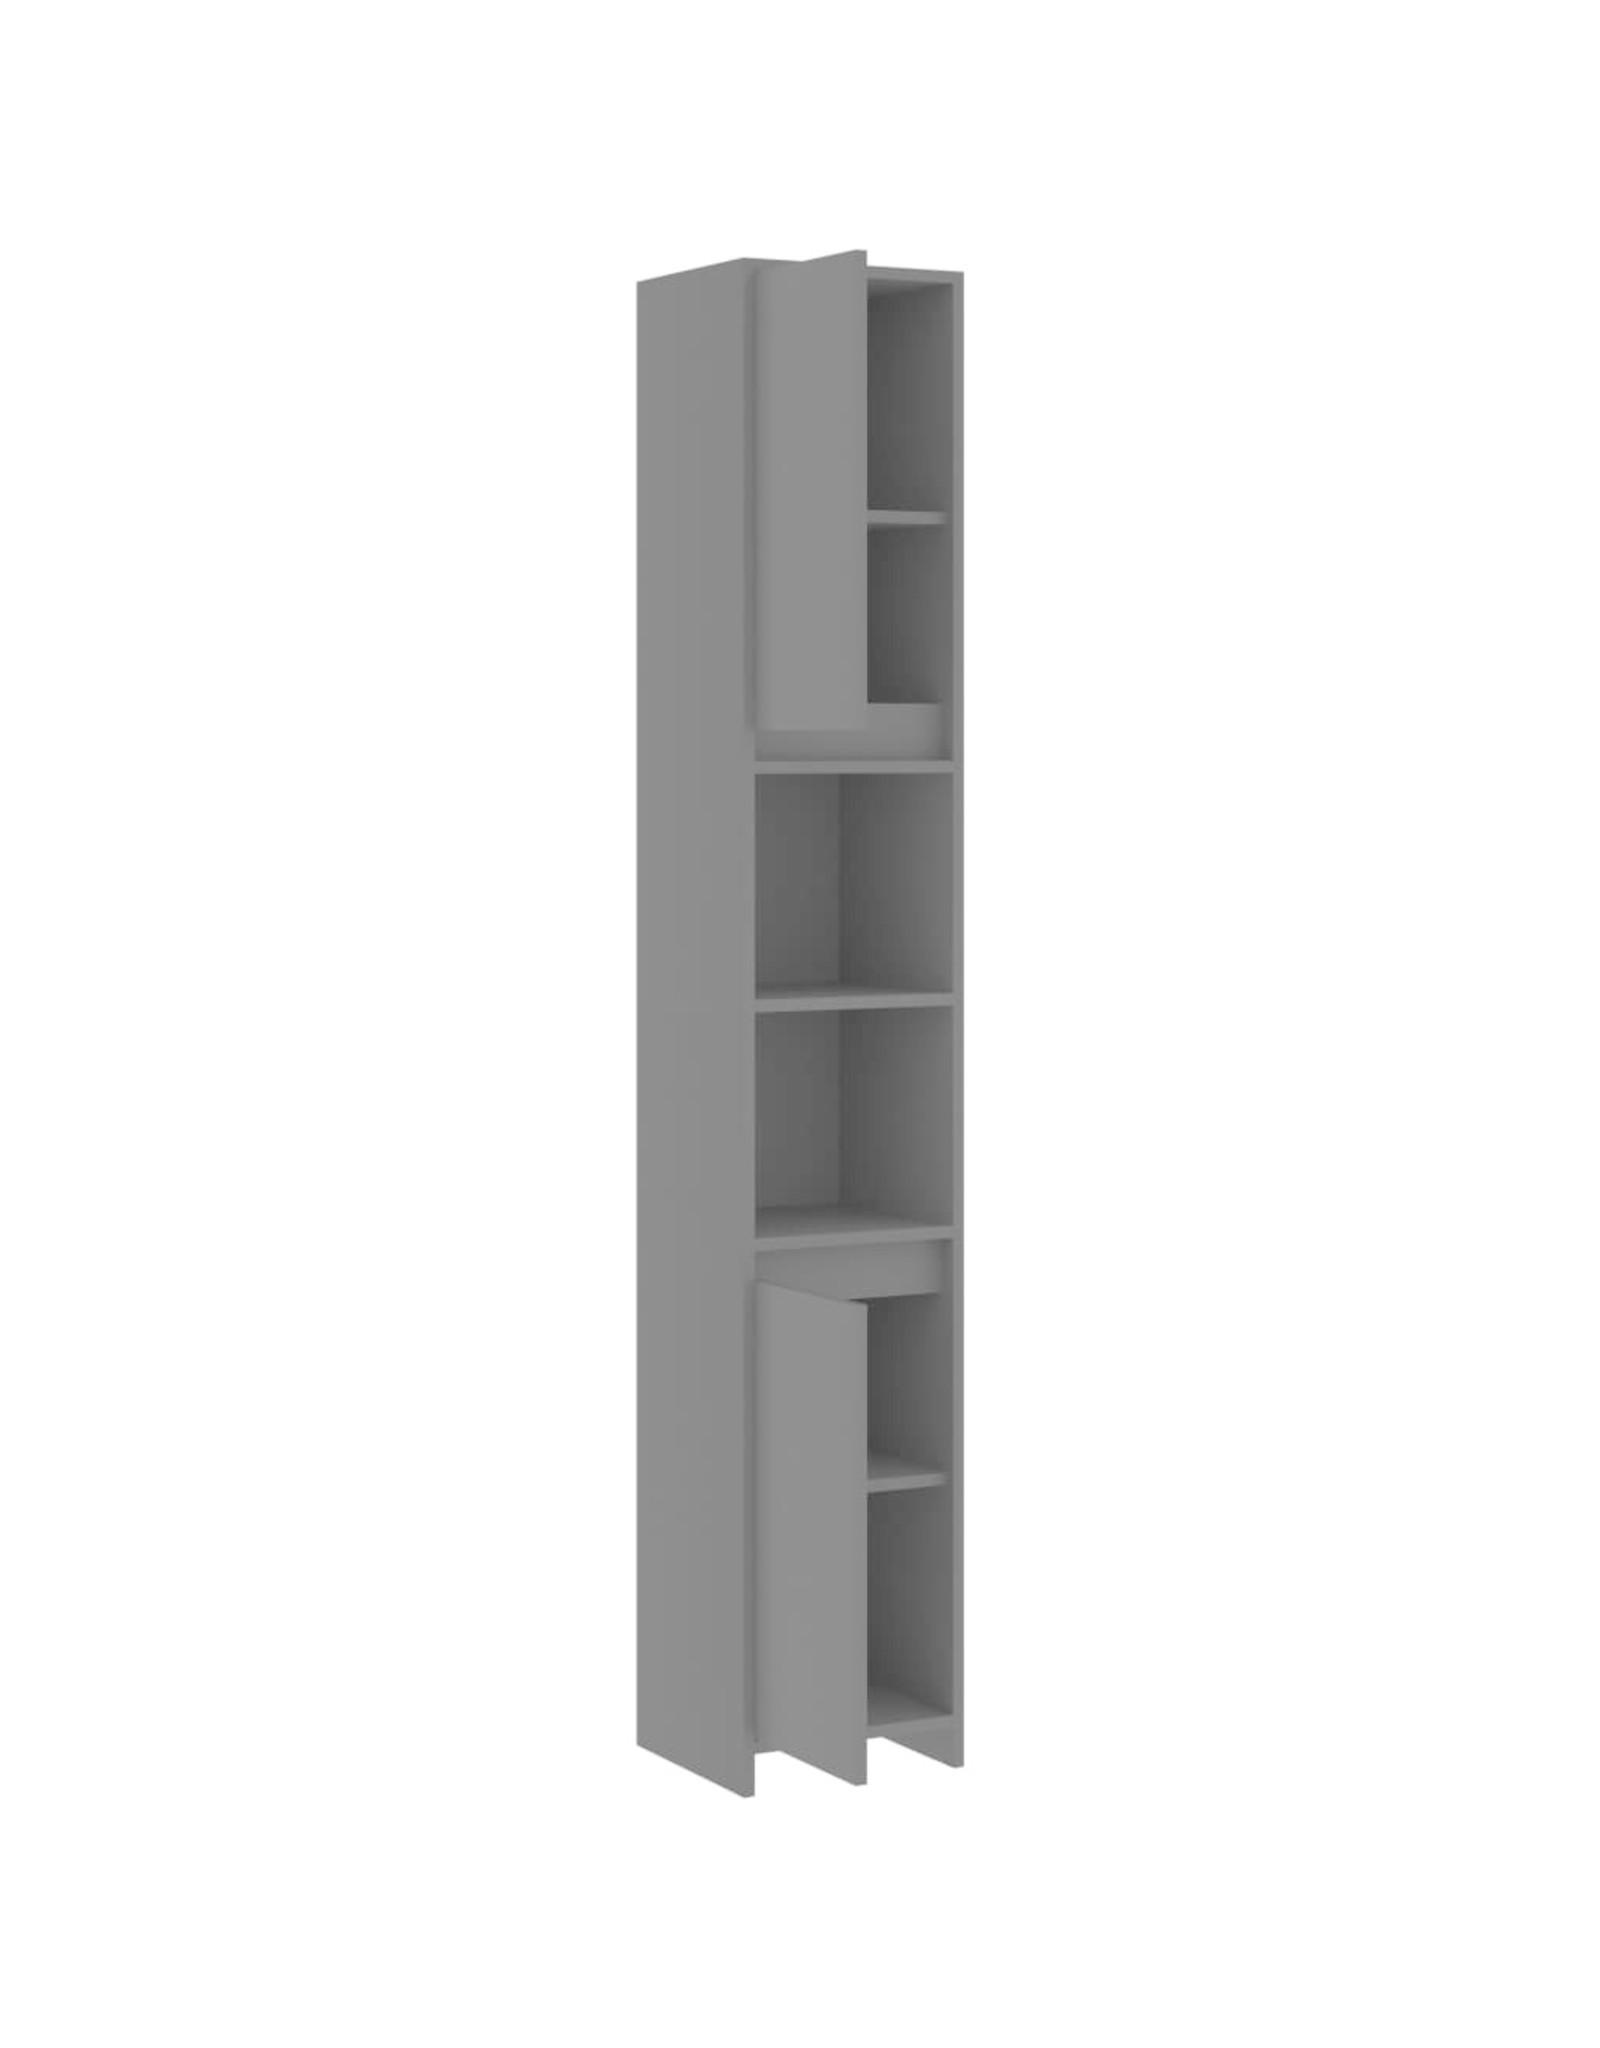 Badkamerkast 30x30x183,5 cm spaanplaat grijs